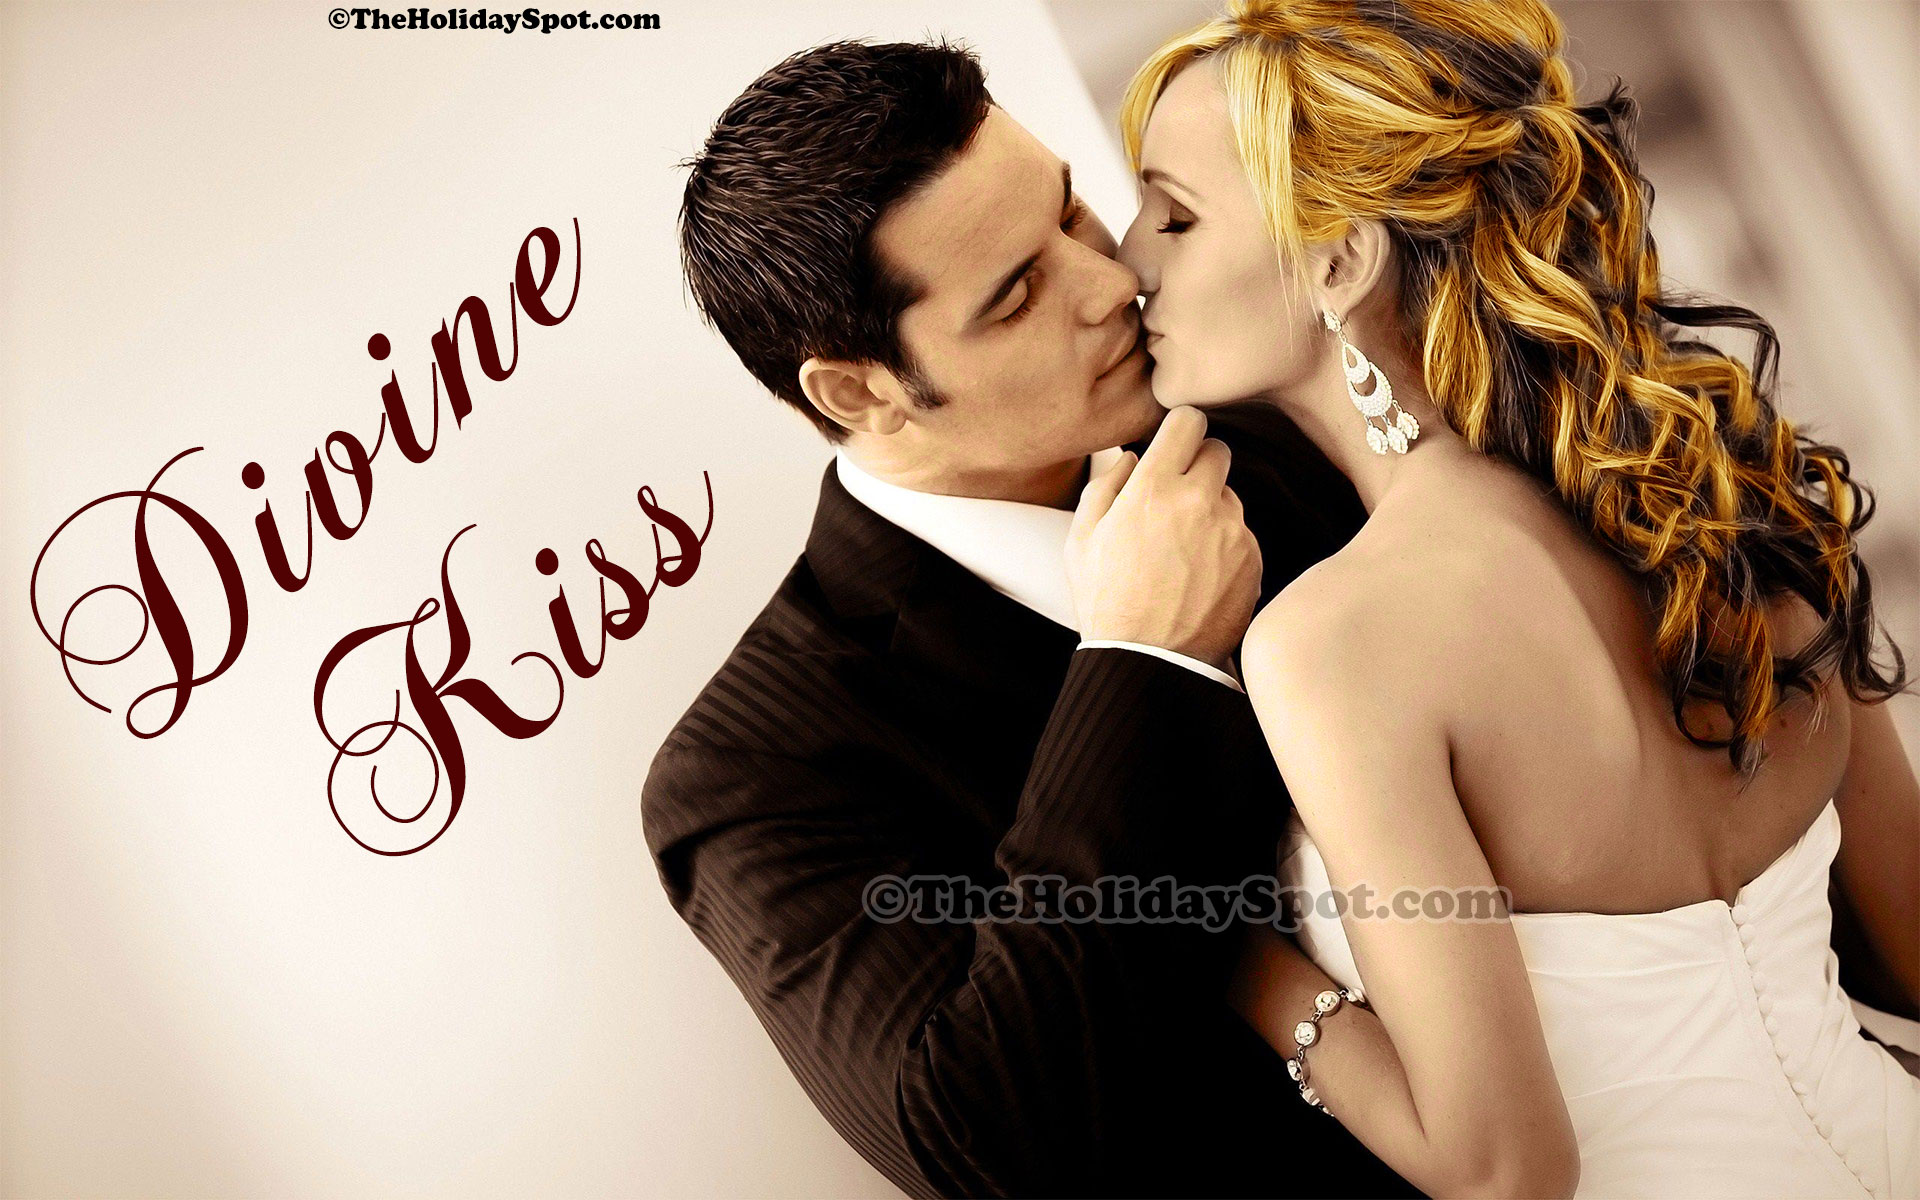 classic kiss wallpaper - photo #28